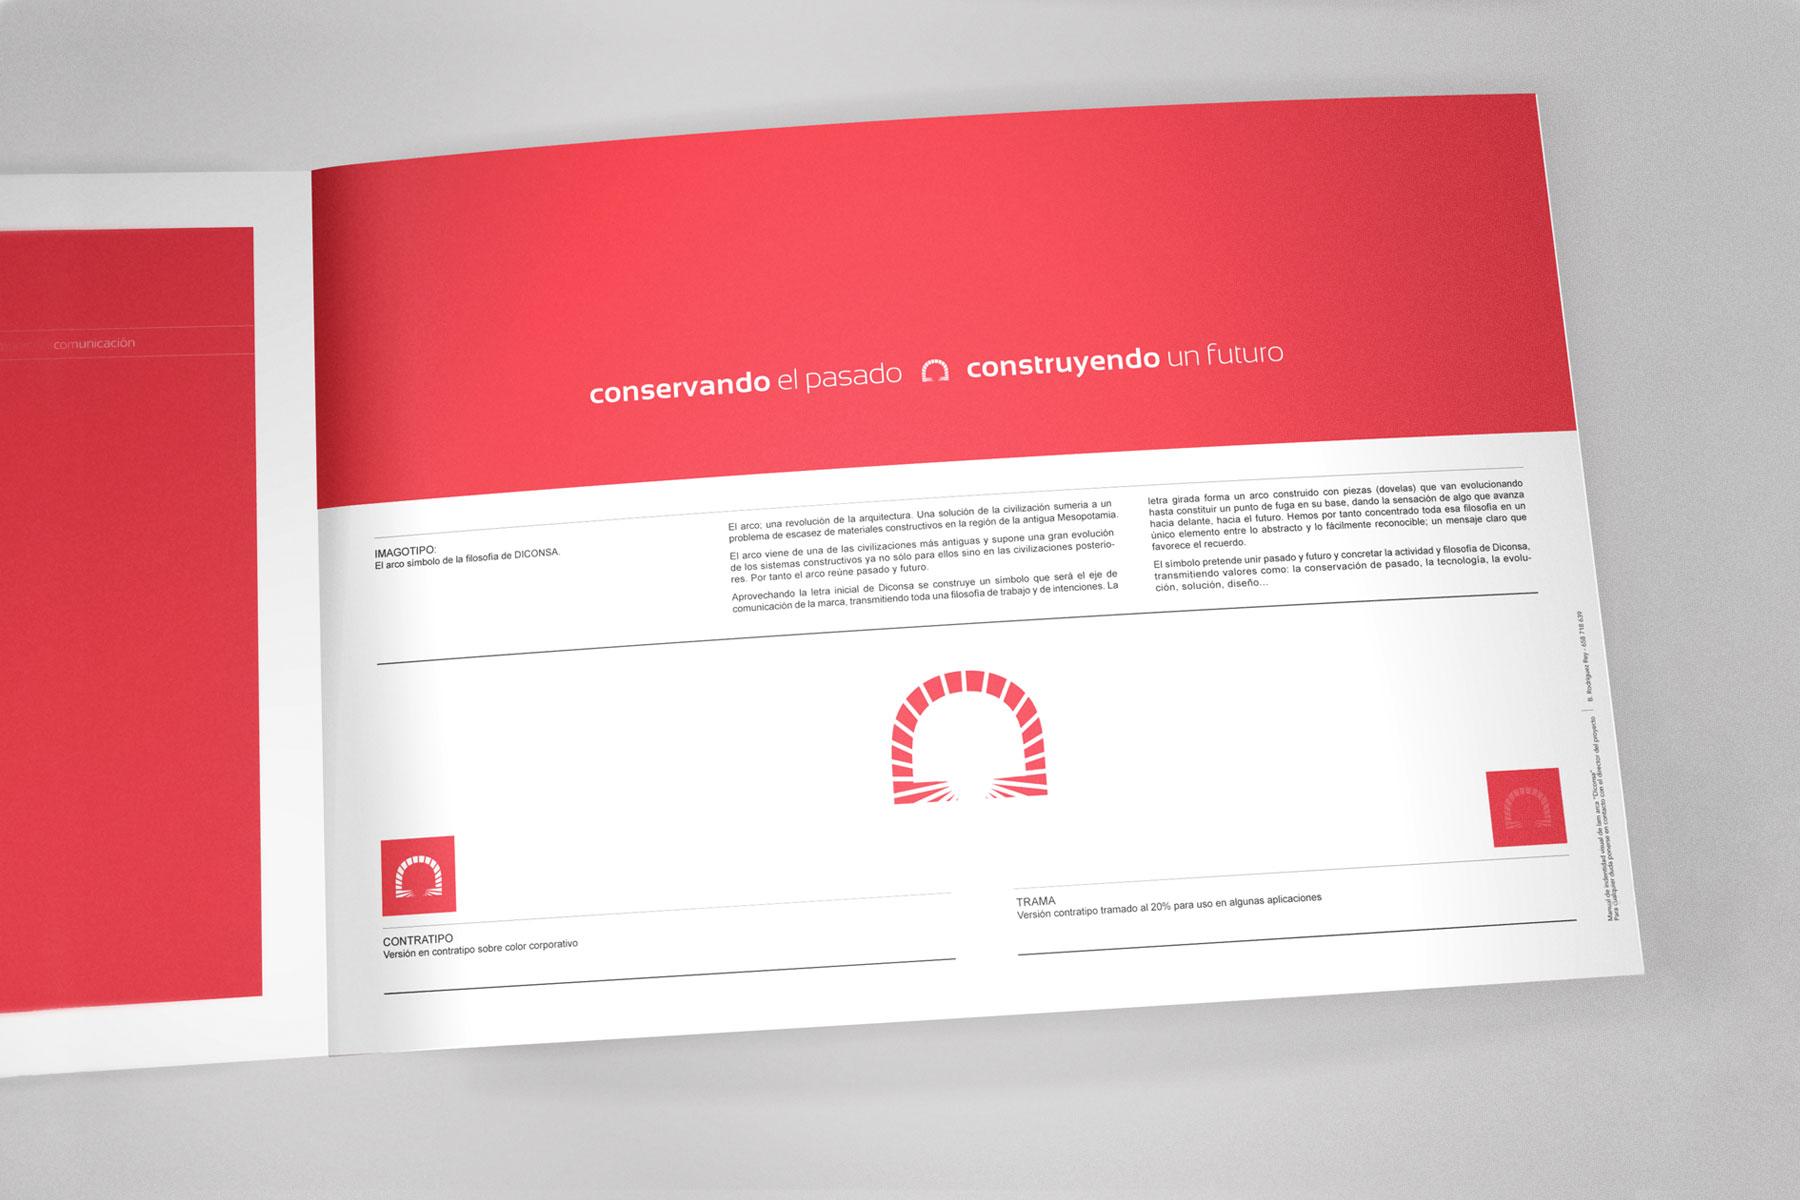 Diconsa Manual de identidad corporativa